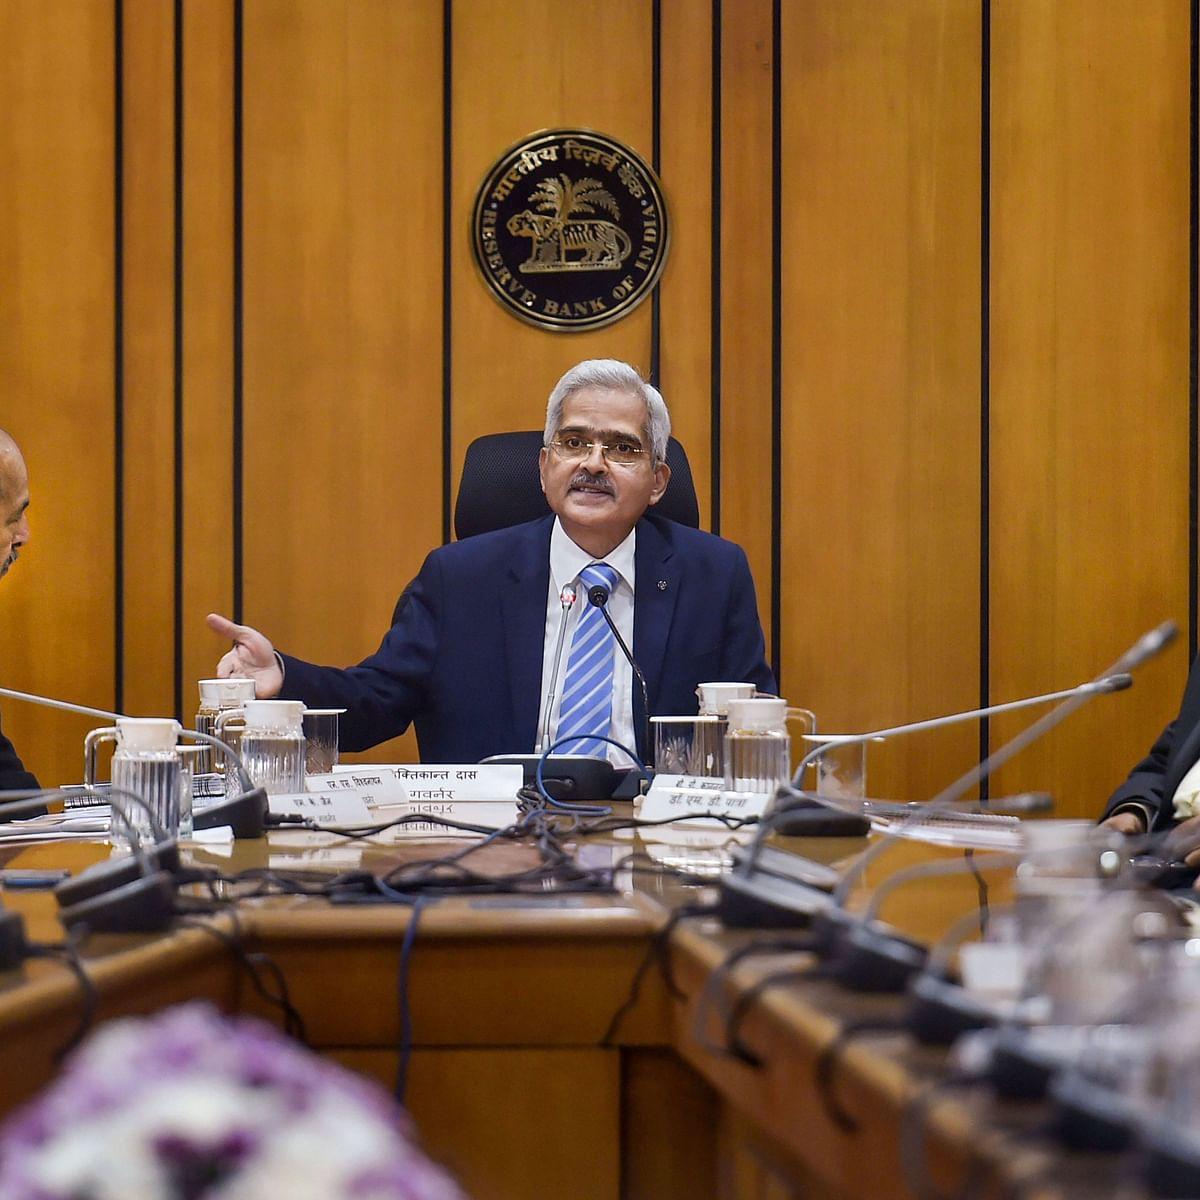 RBI central board faces shortage of 9 non-official directors